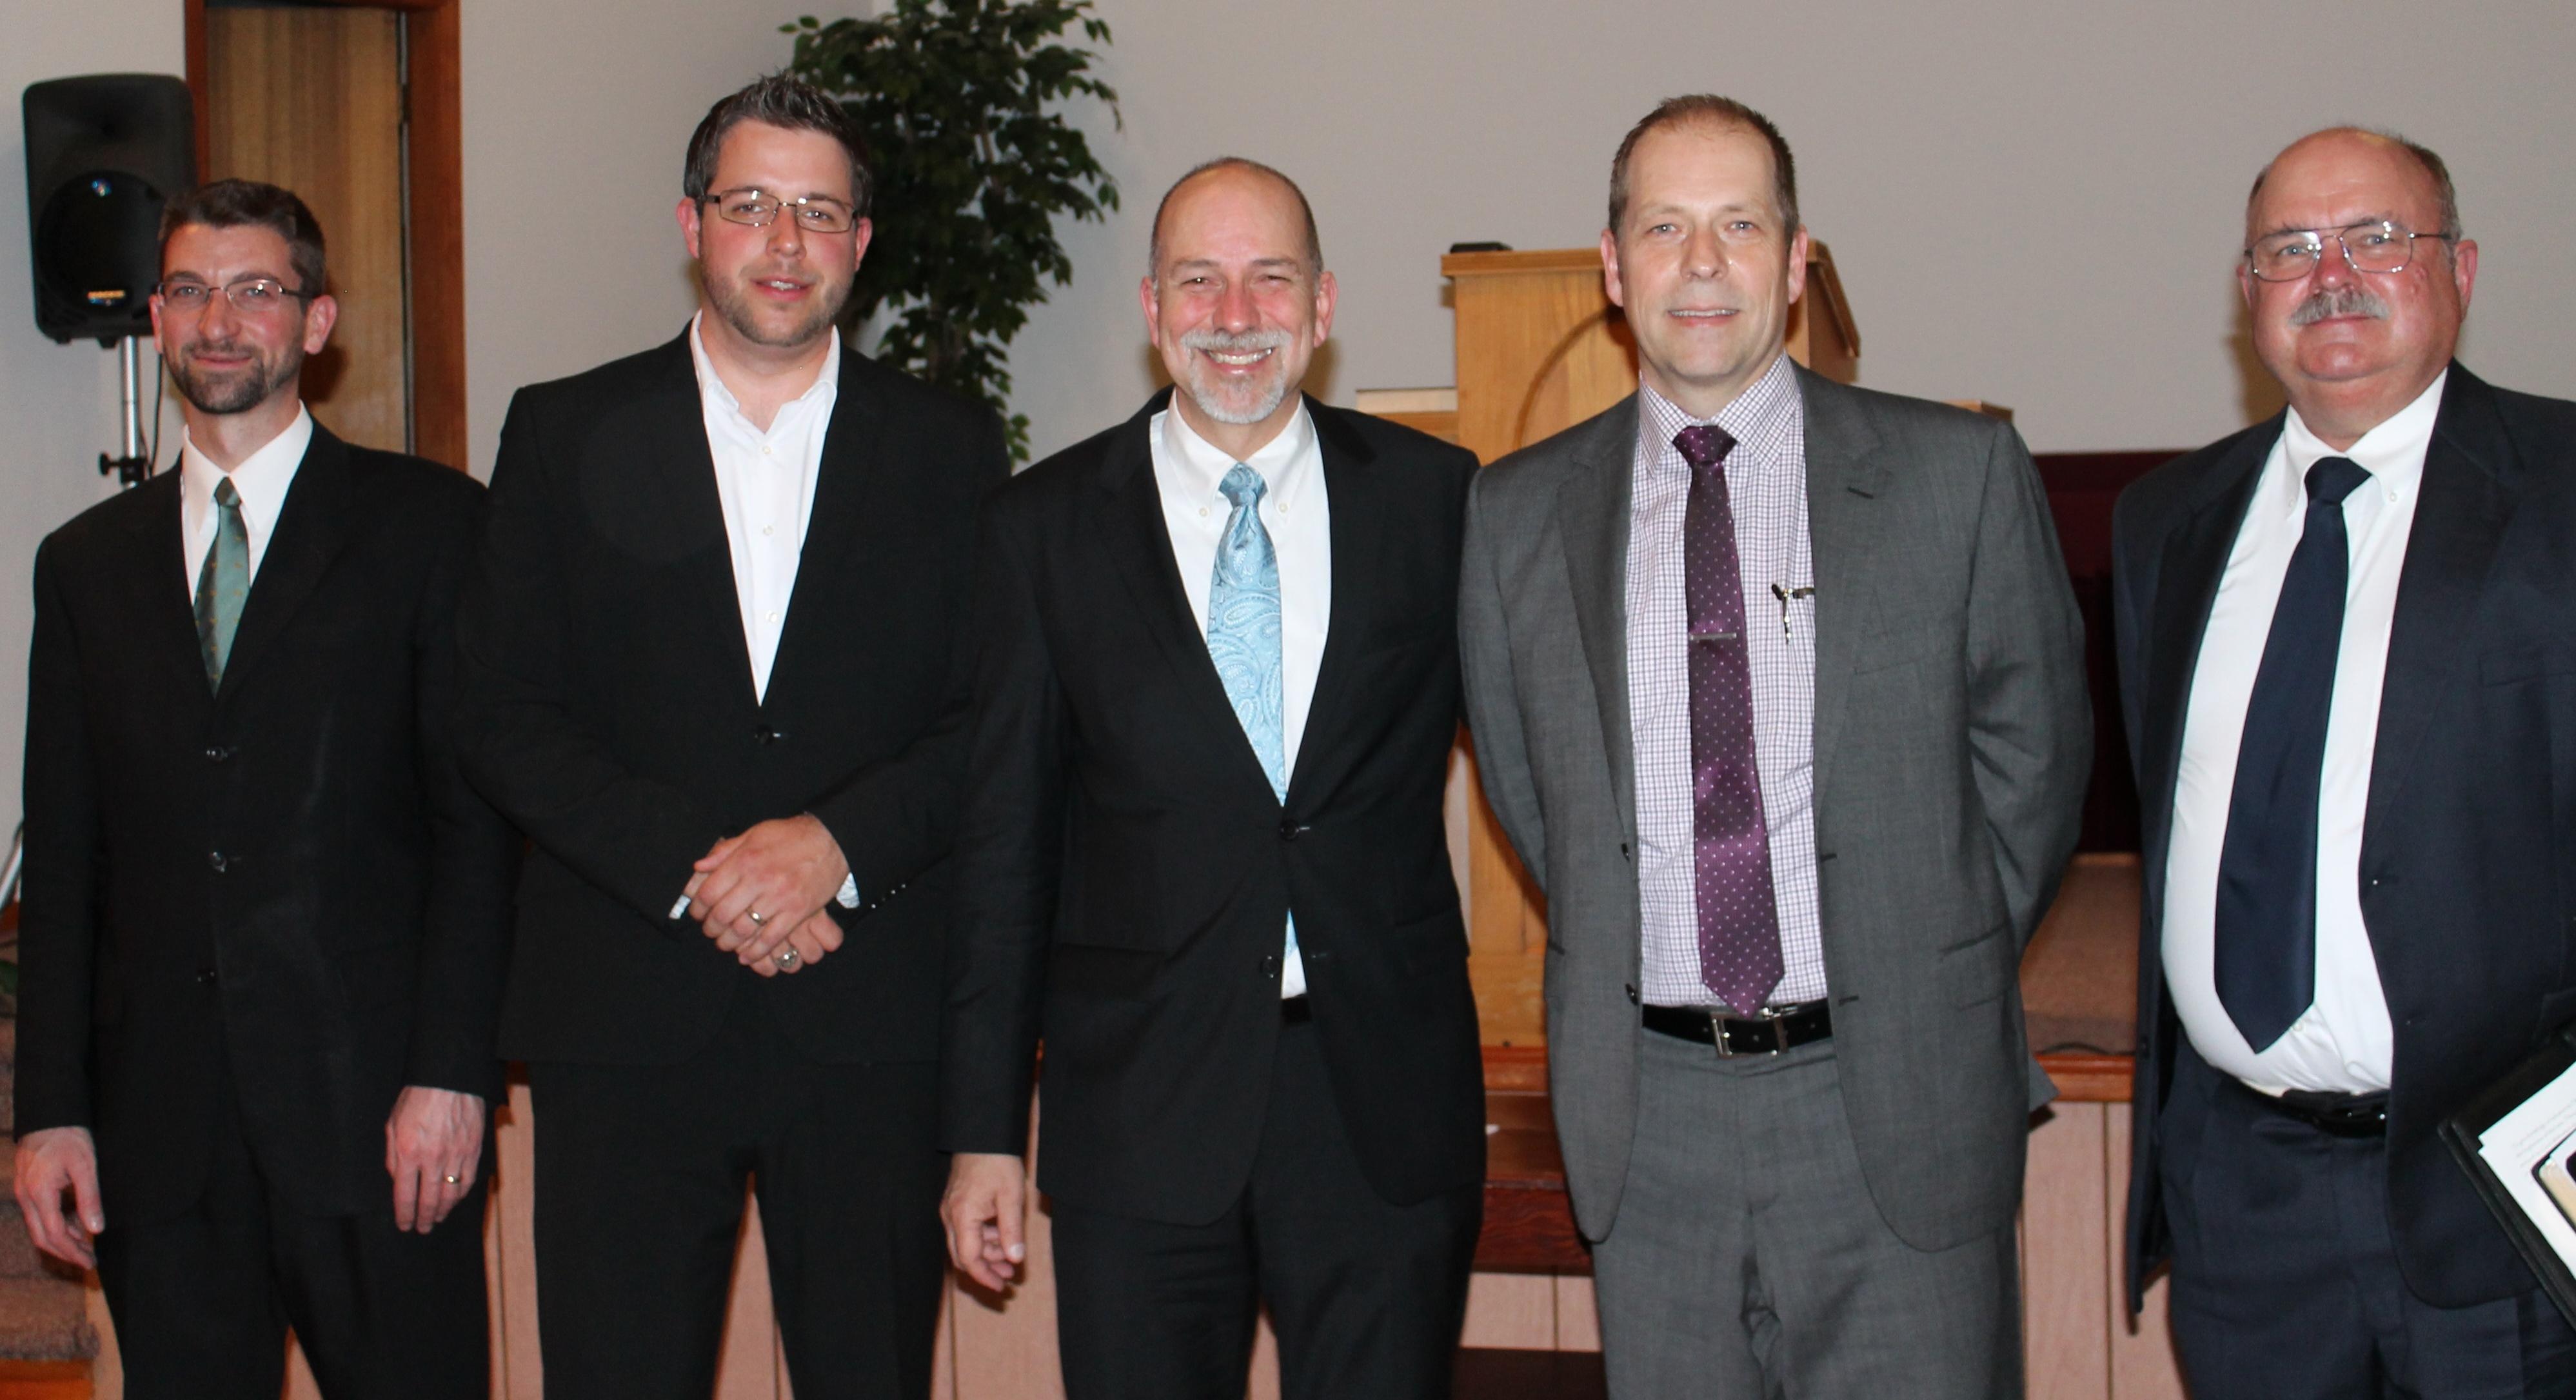 Occasion Speech For Pastor Installation